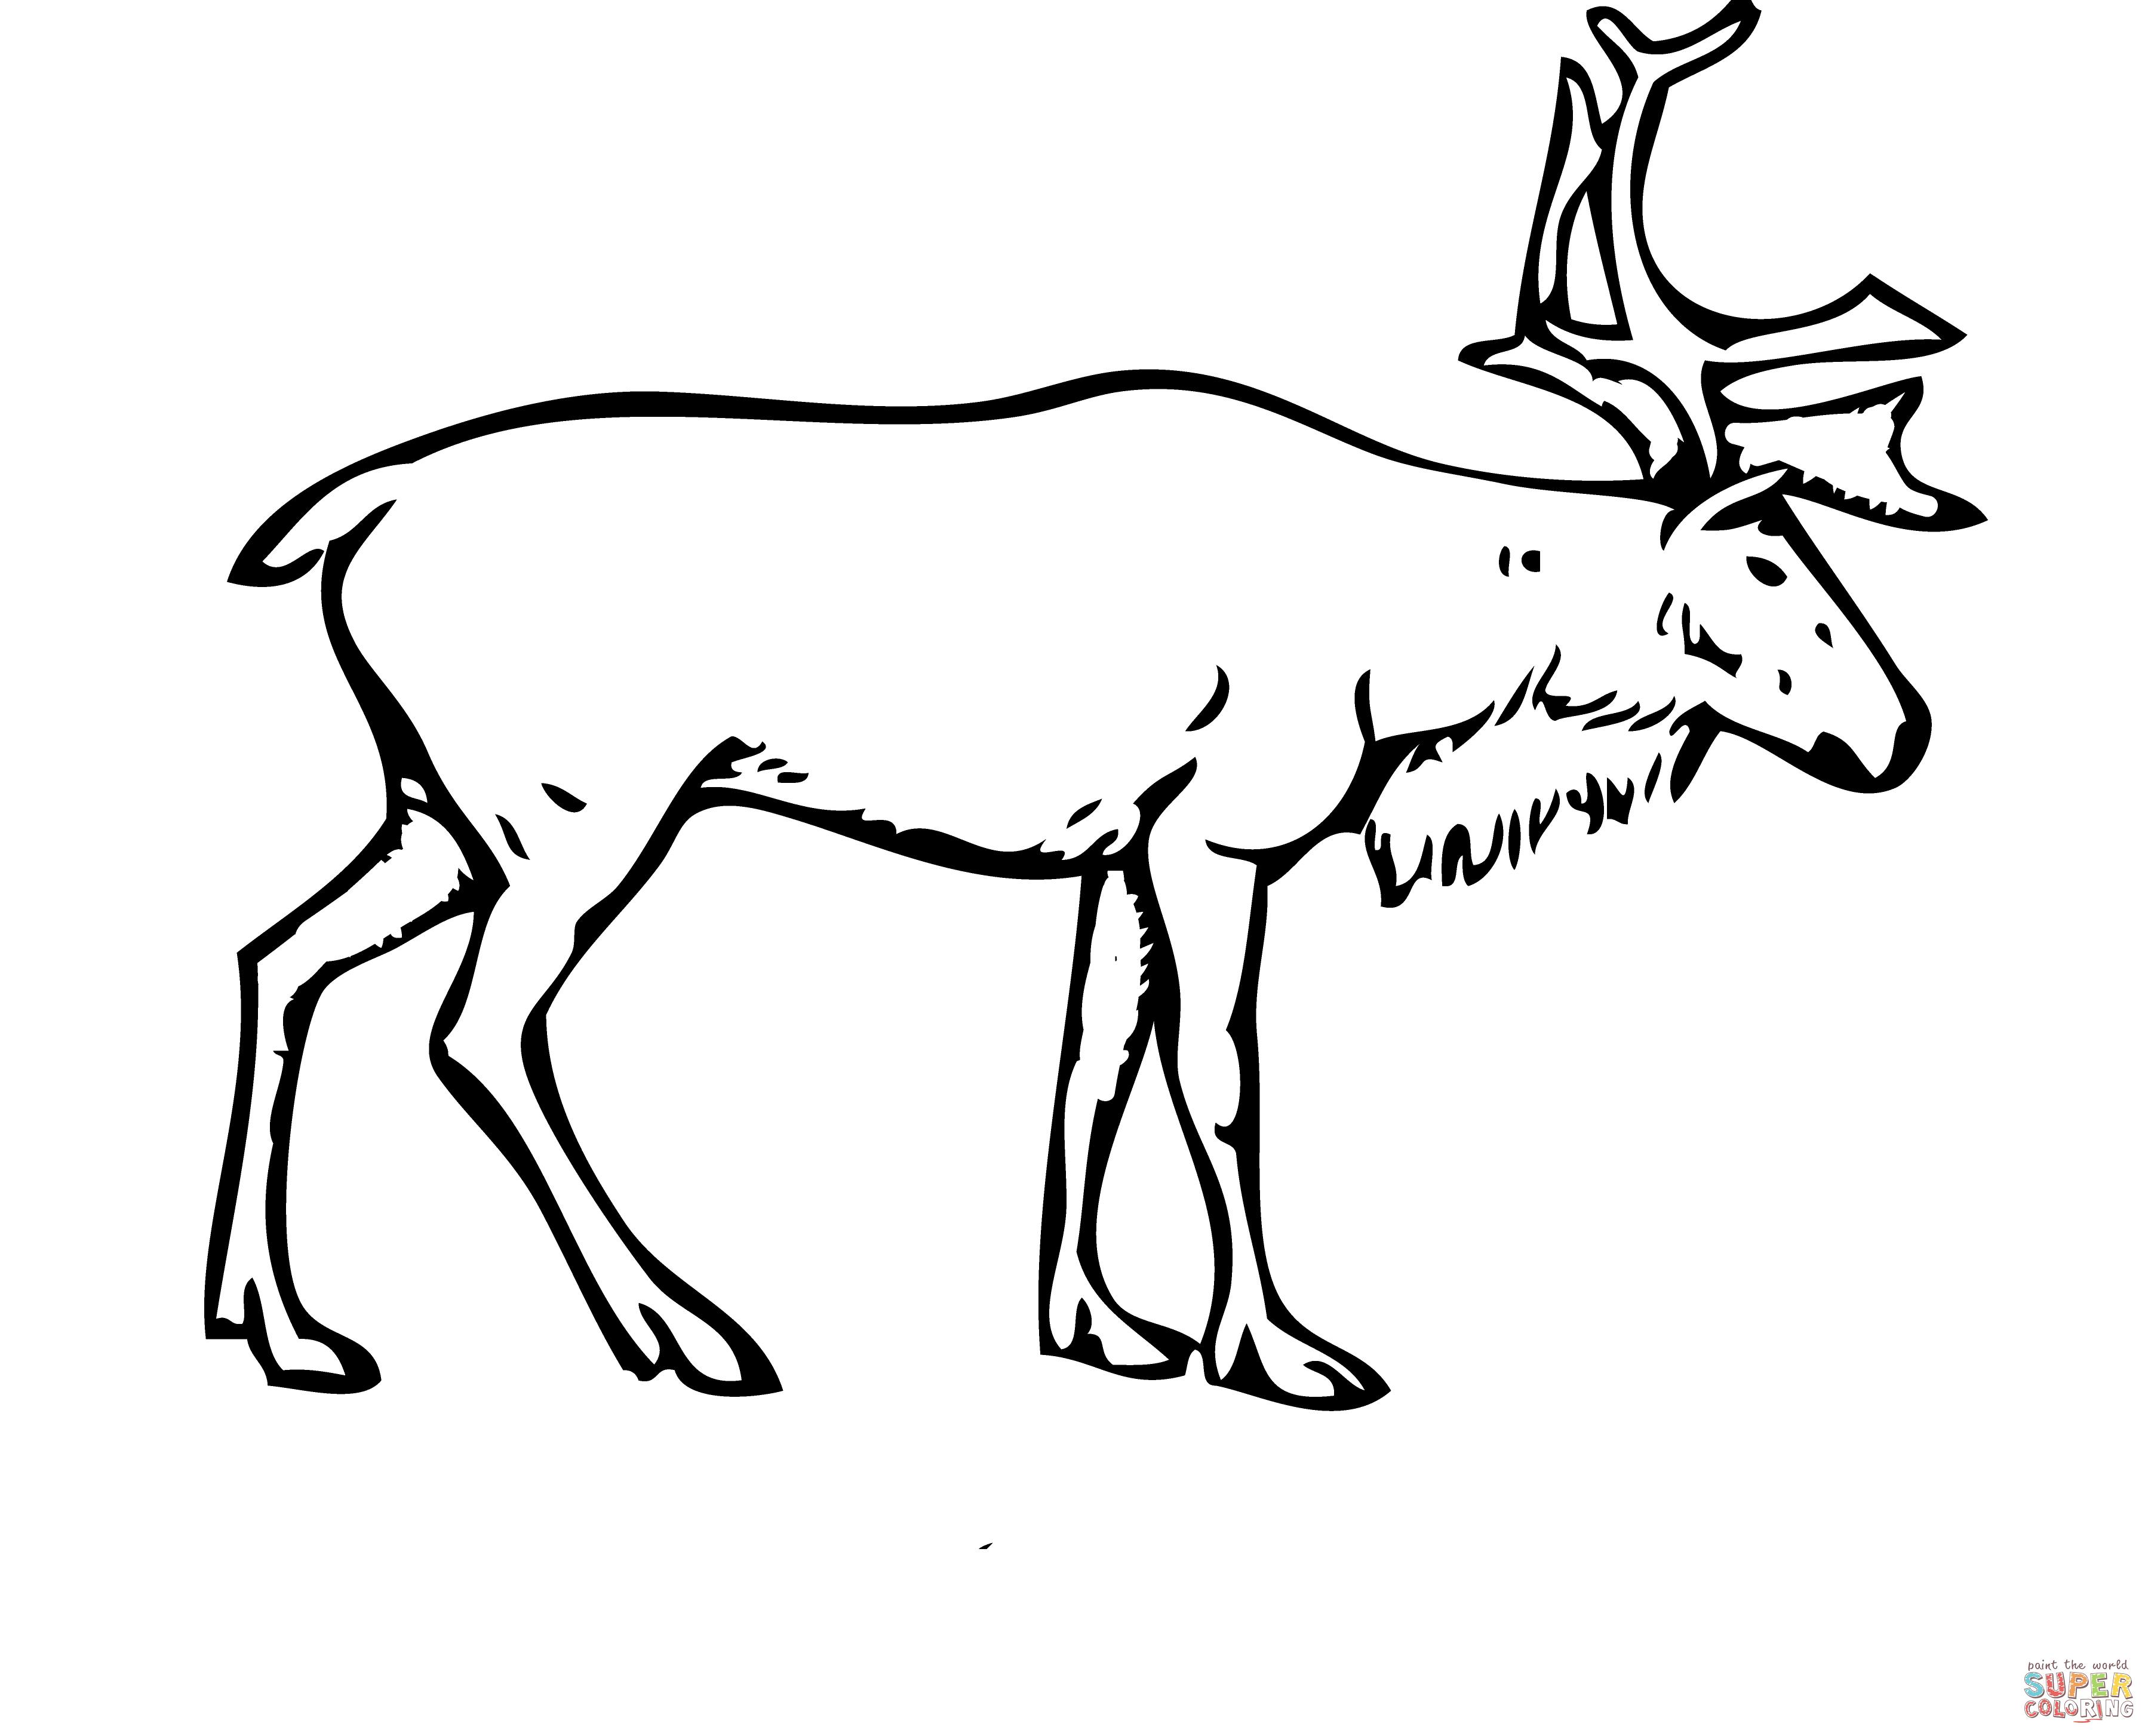 reindeer drawing template at getdrawings  free for